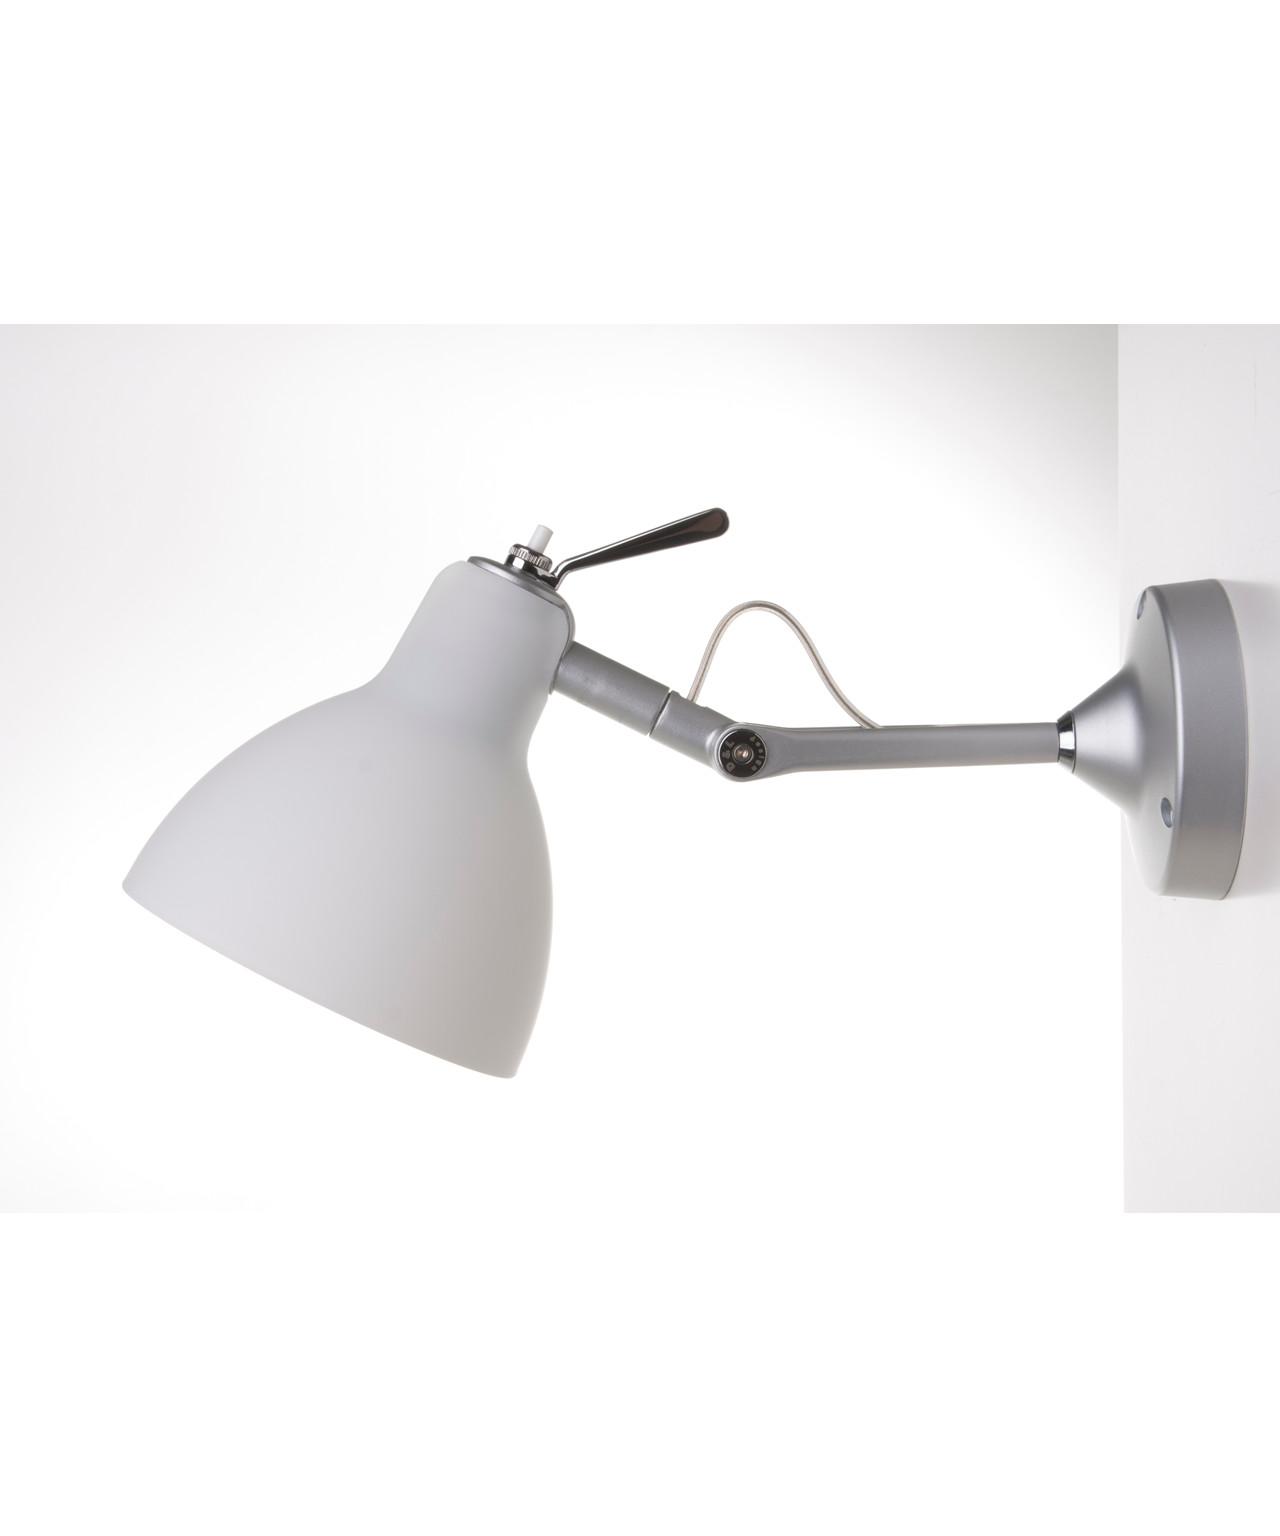 Luxy h0 væglampe/loftlampe alu/mat hvid